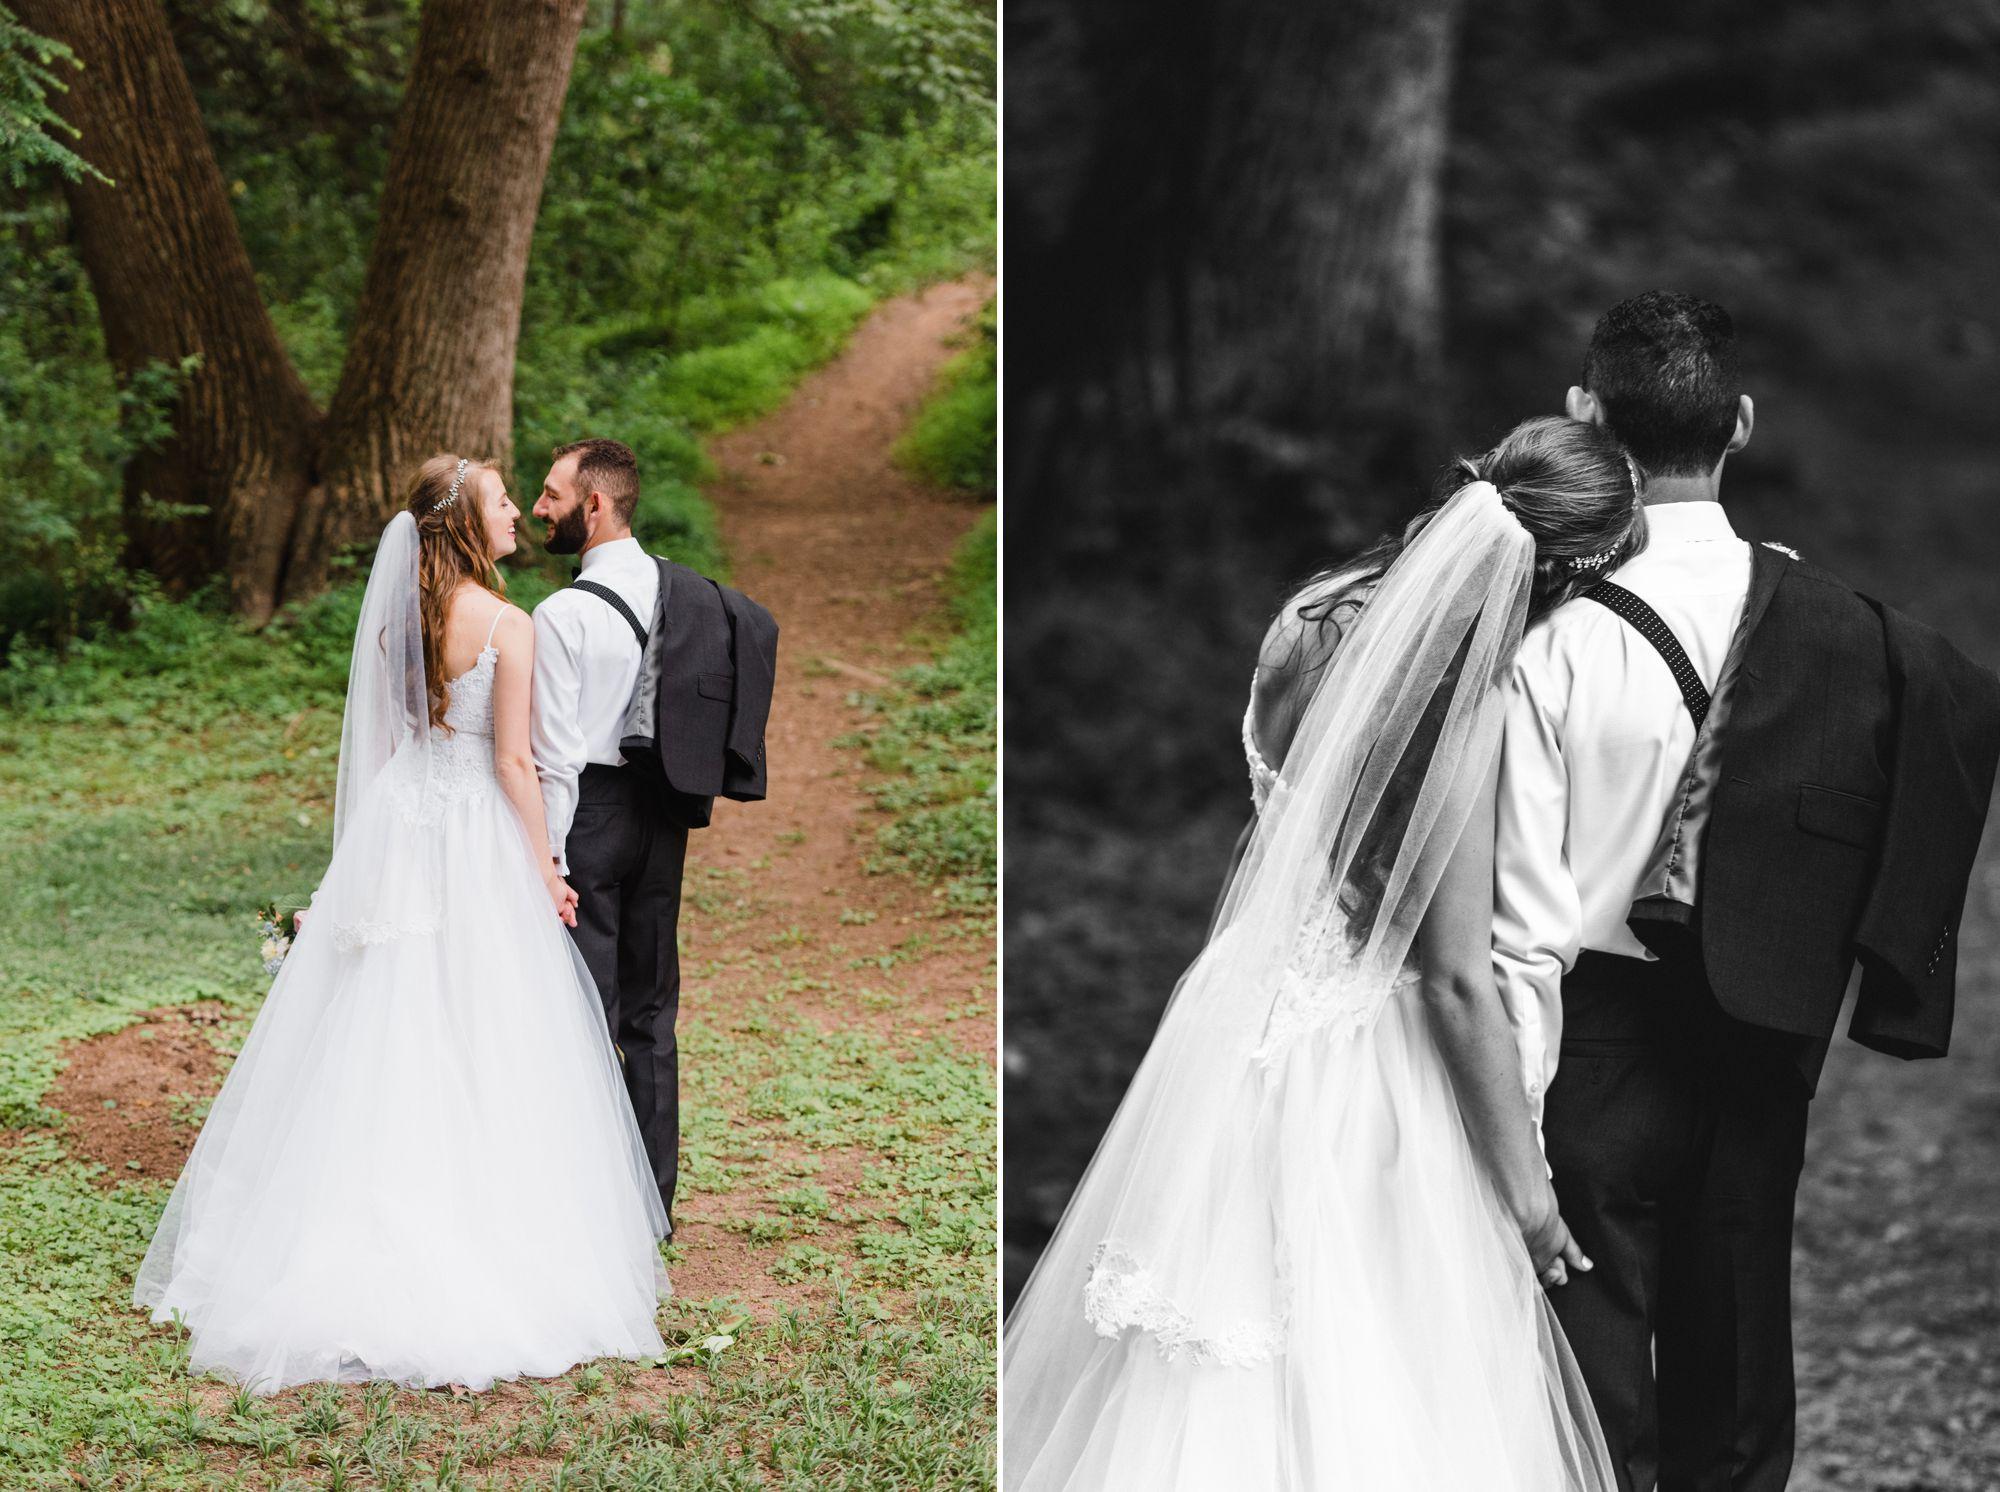 uptown-charlotte-orthodox-greek-wedding 80